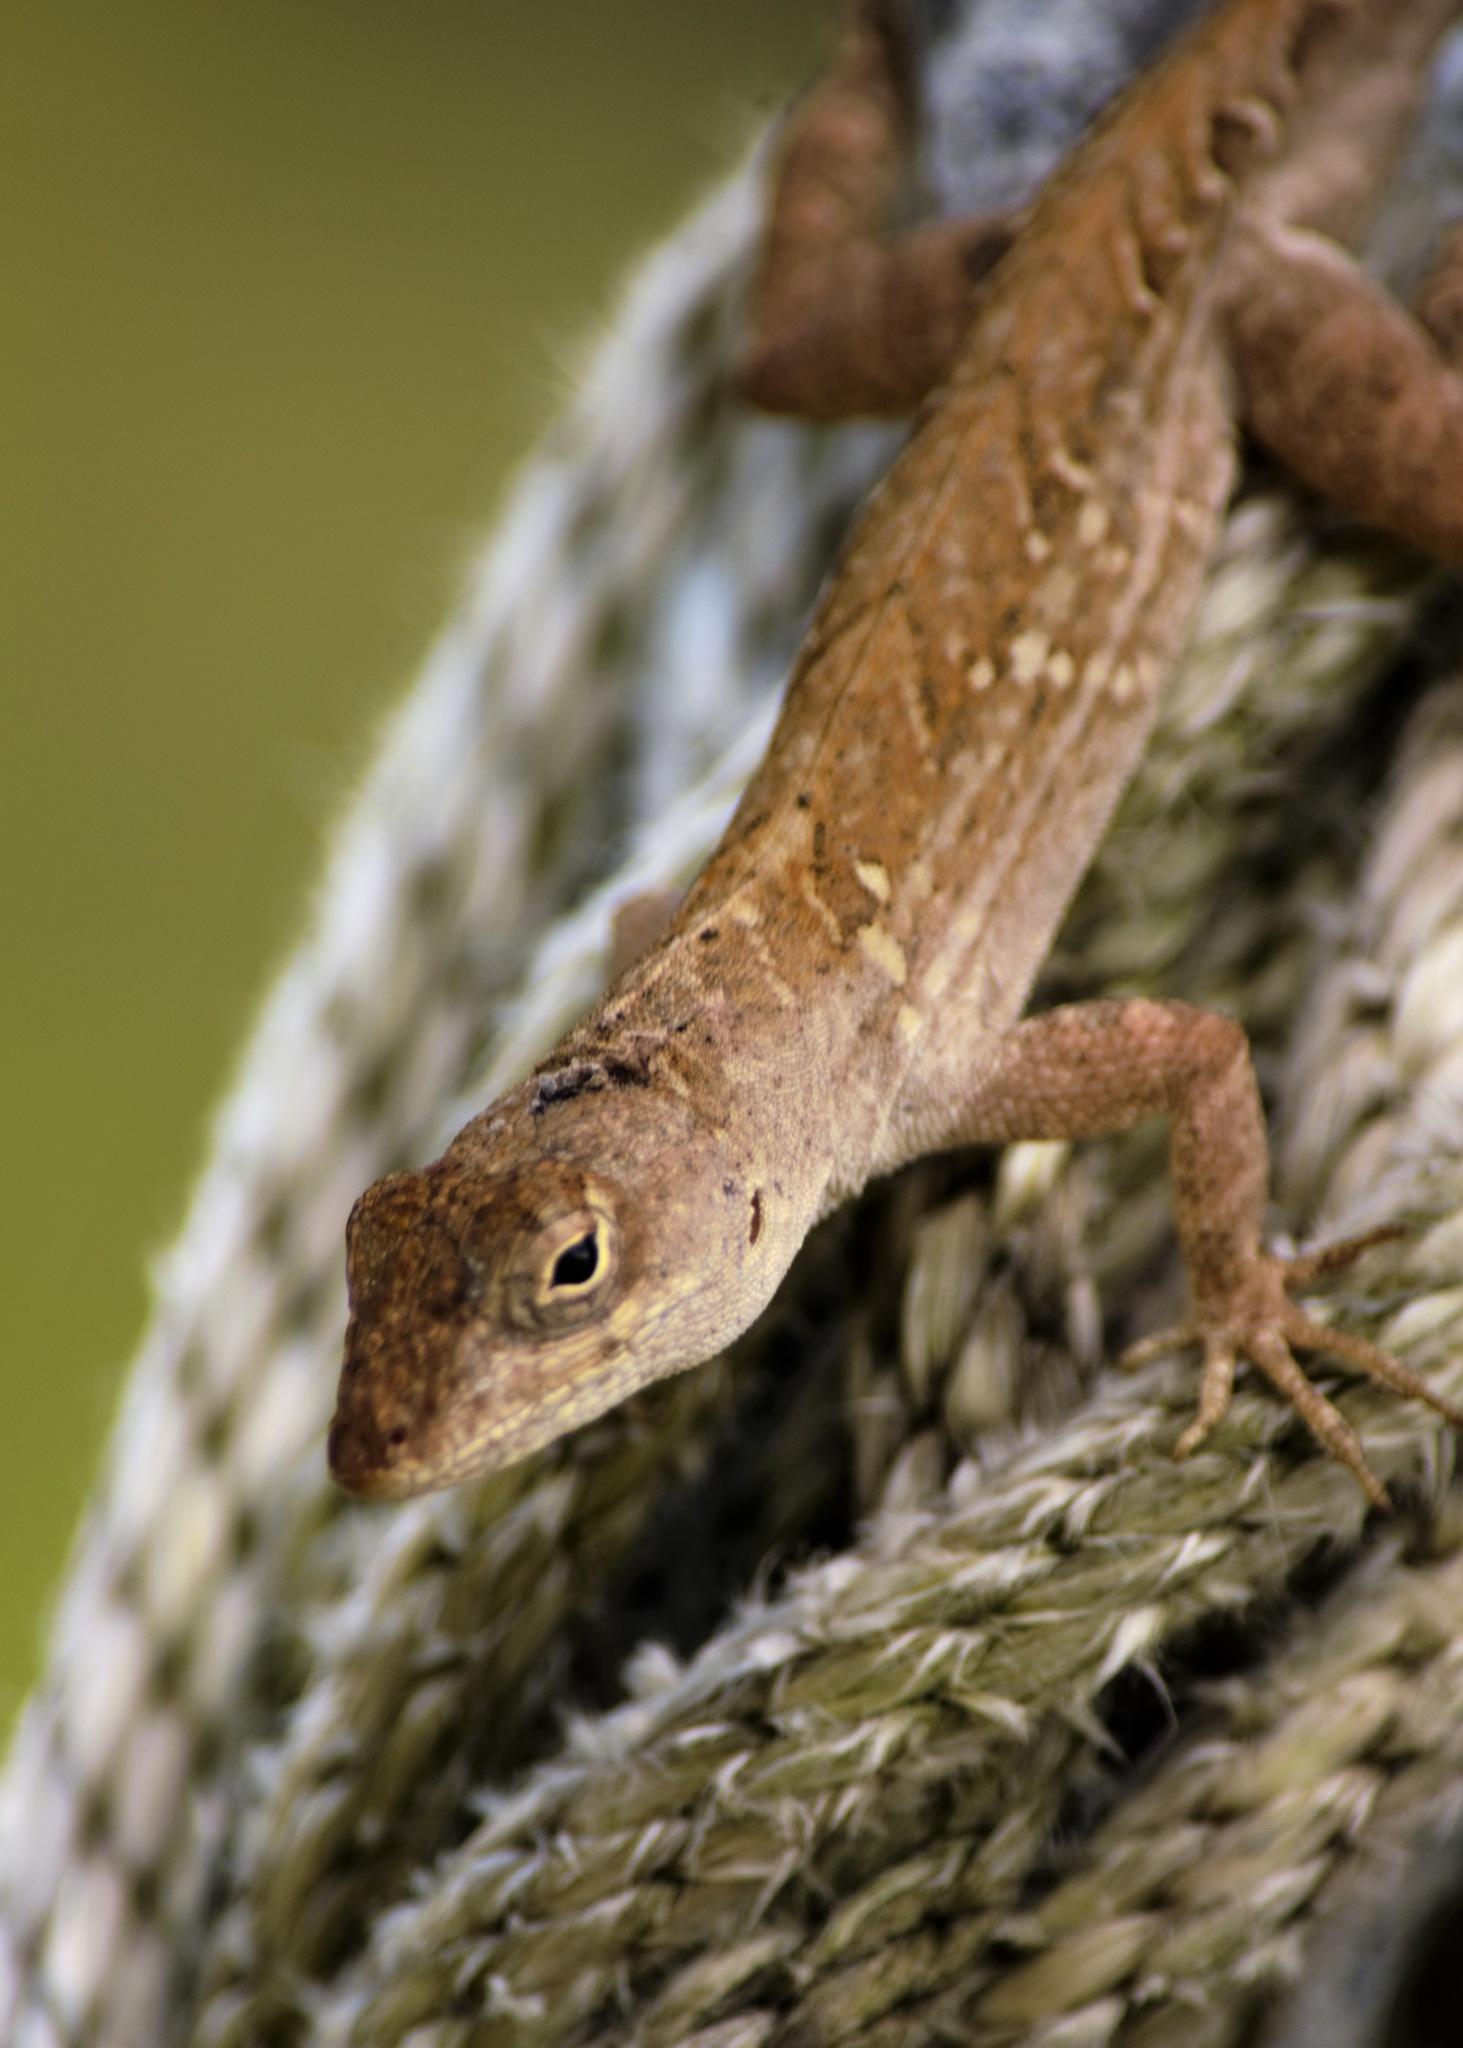 Lizard on rope by dabbleshots